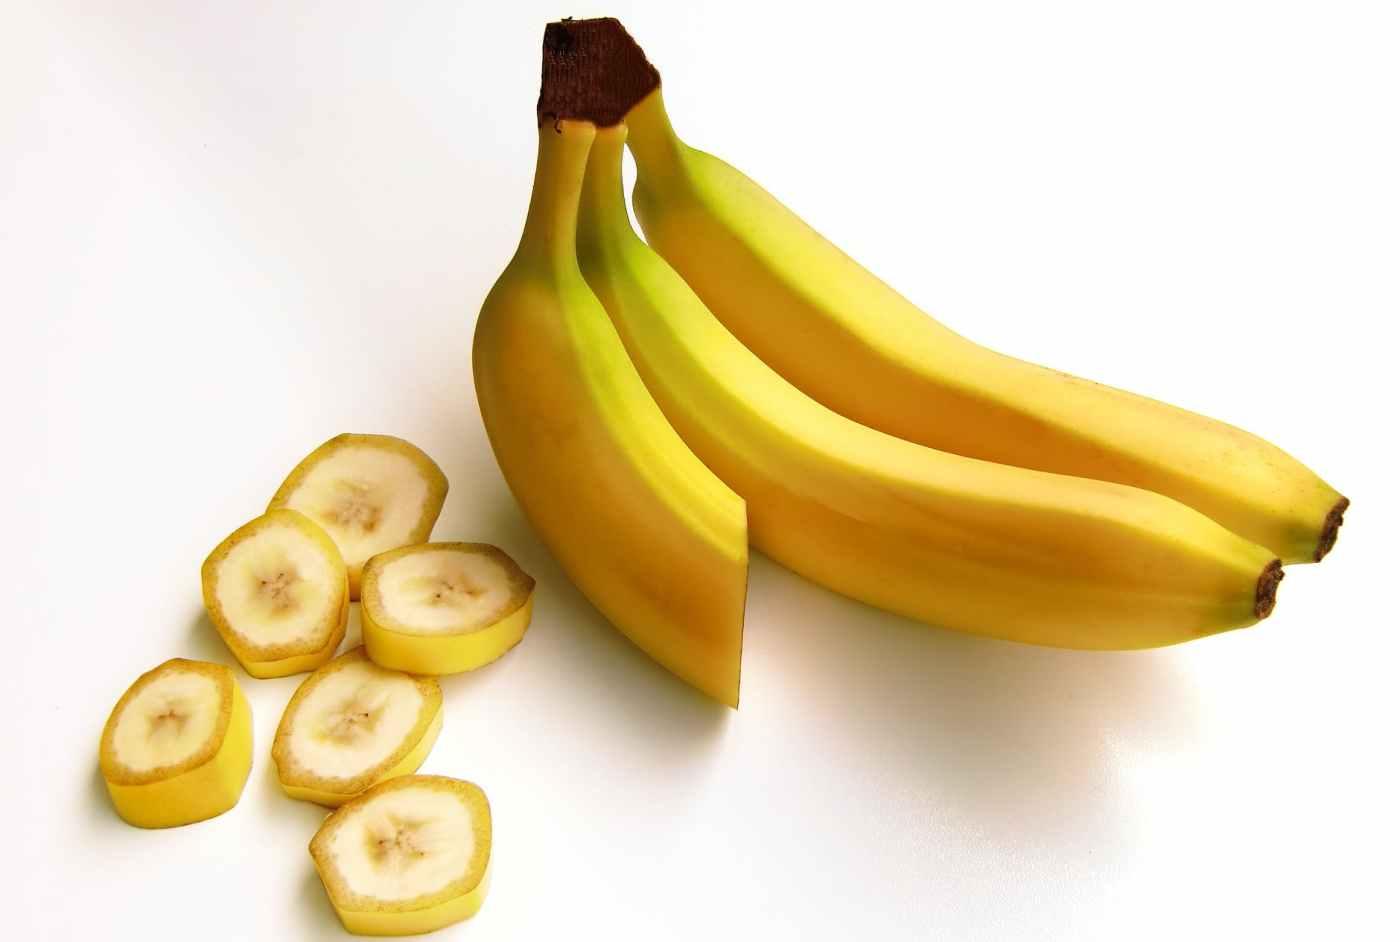 bananas-fruit-carbohydrates-sweet-38283.jpeg